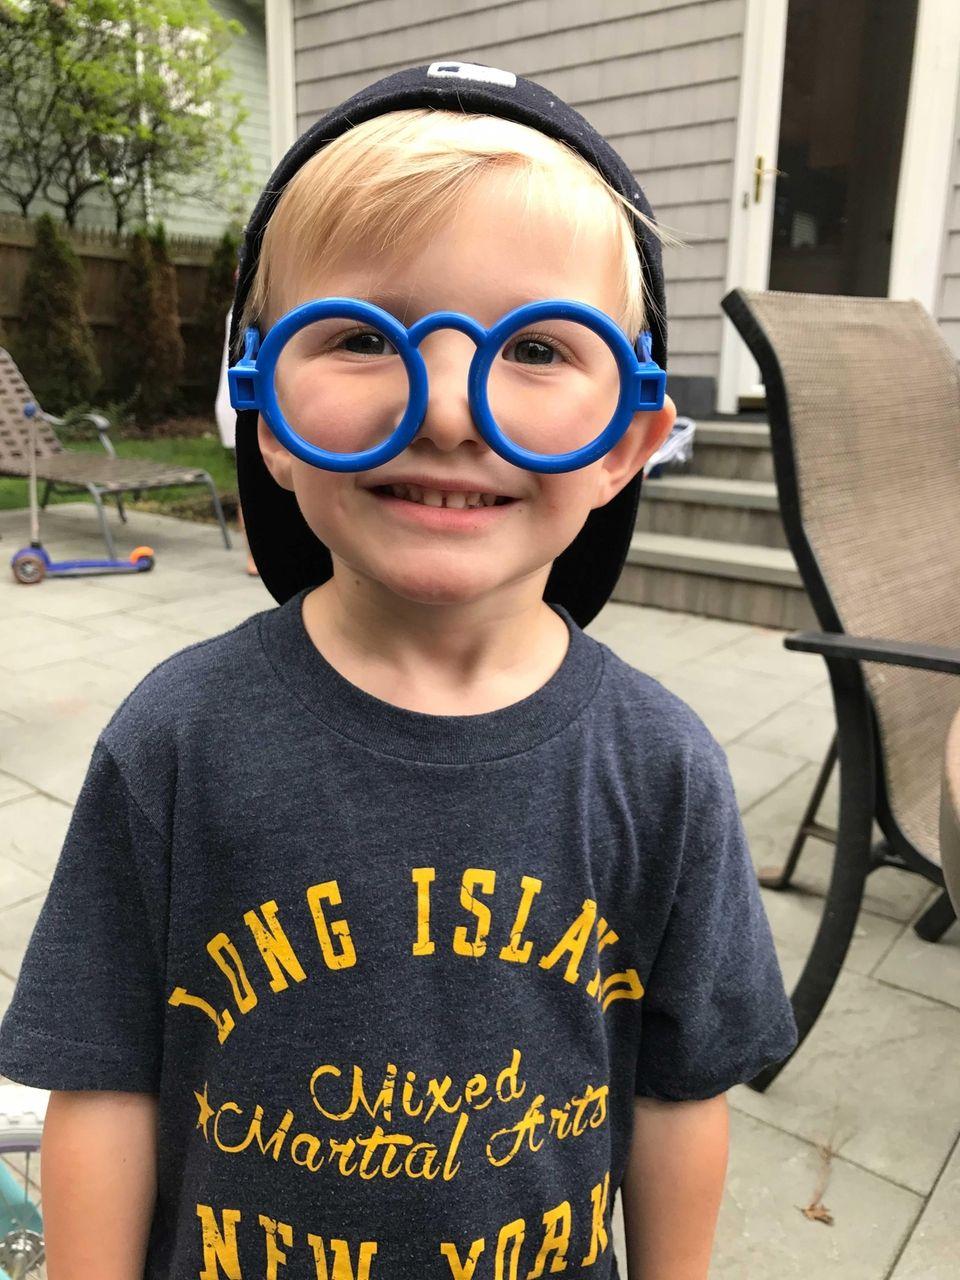 His parent's hack: